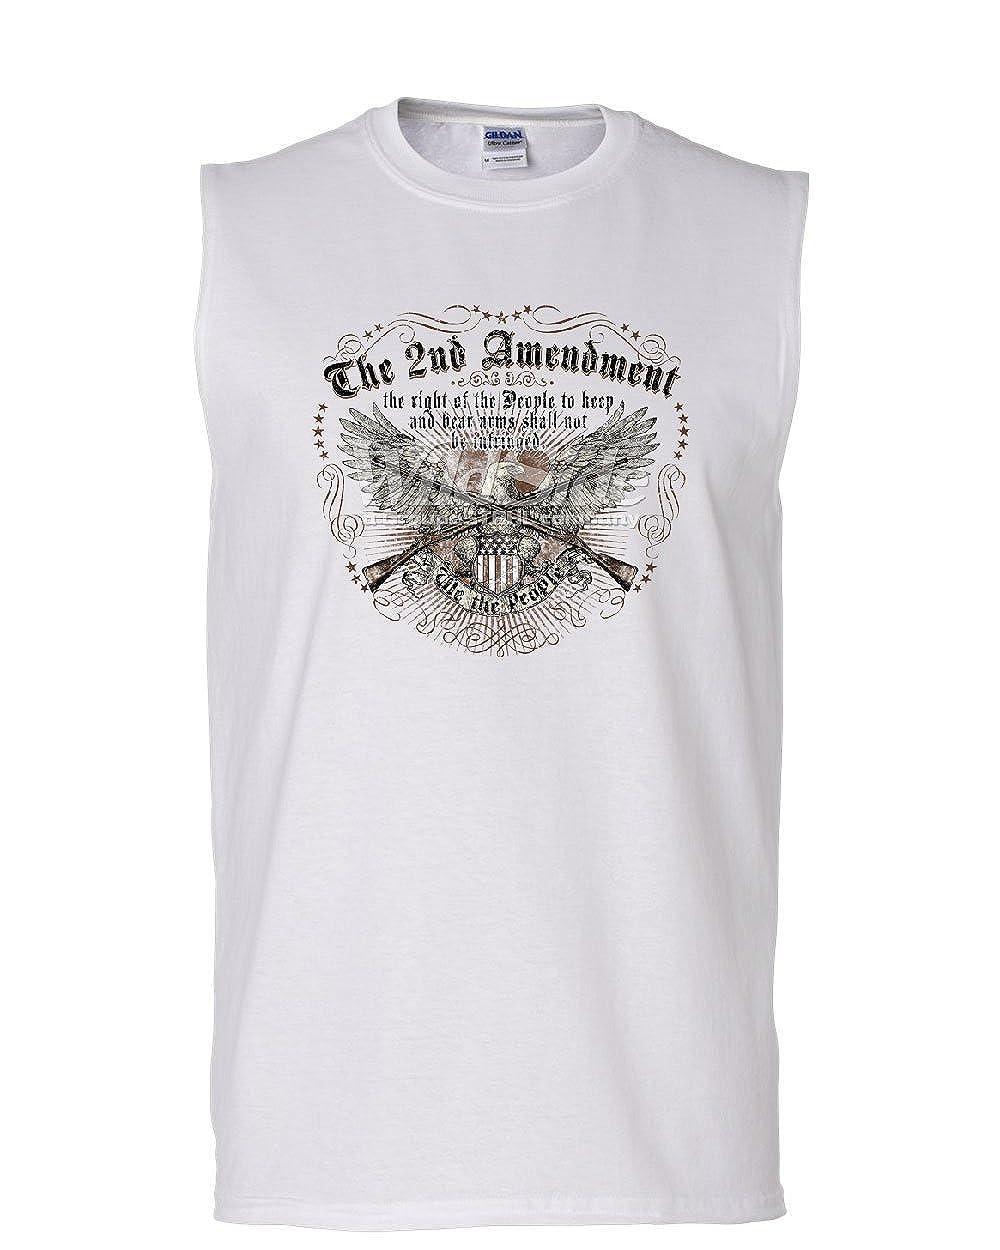 Tee Hunt The 2nd Amendment Muscle Shirt We The People Bald Eagle Rifles 2A USA Sleeveless